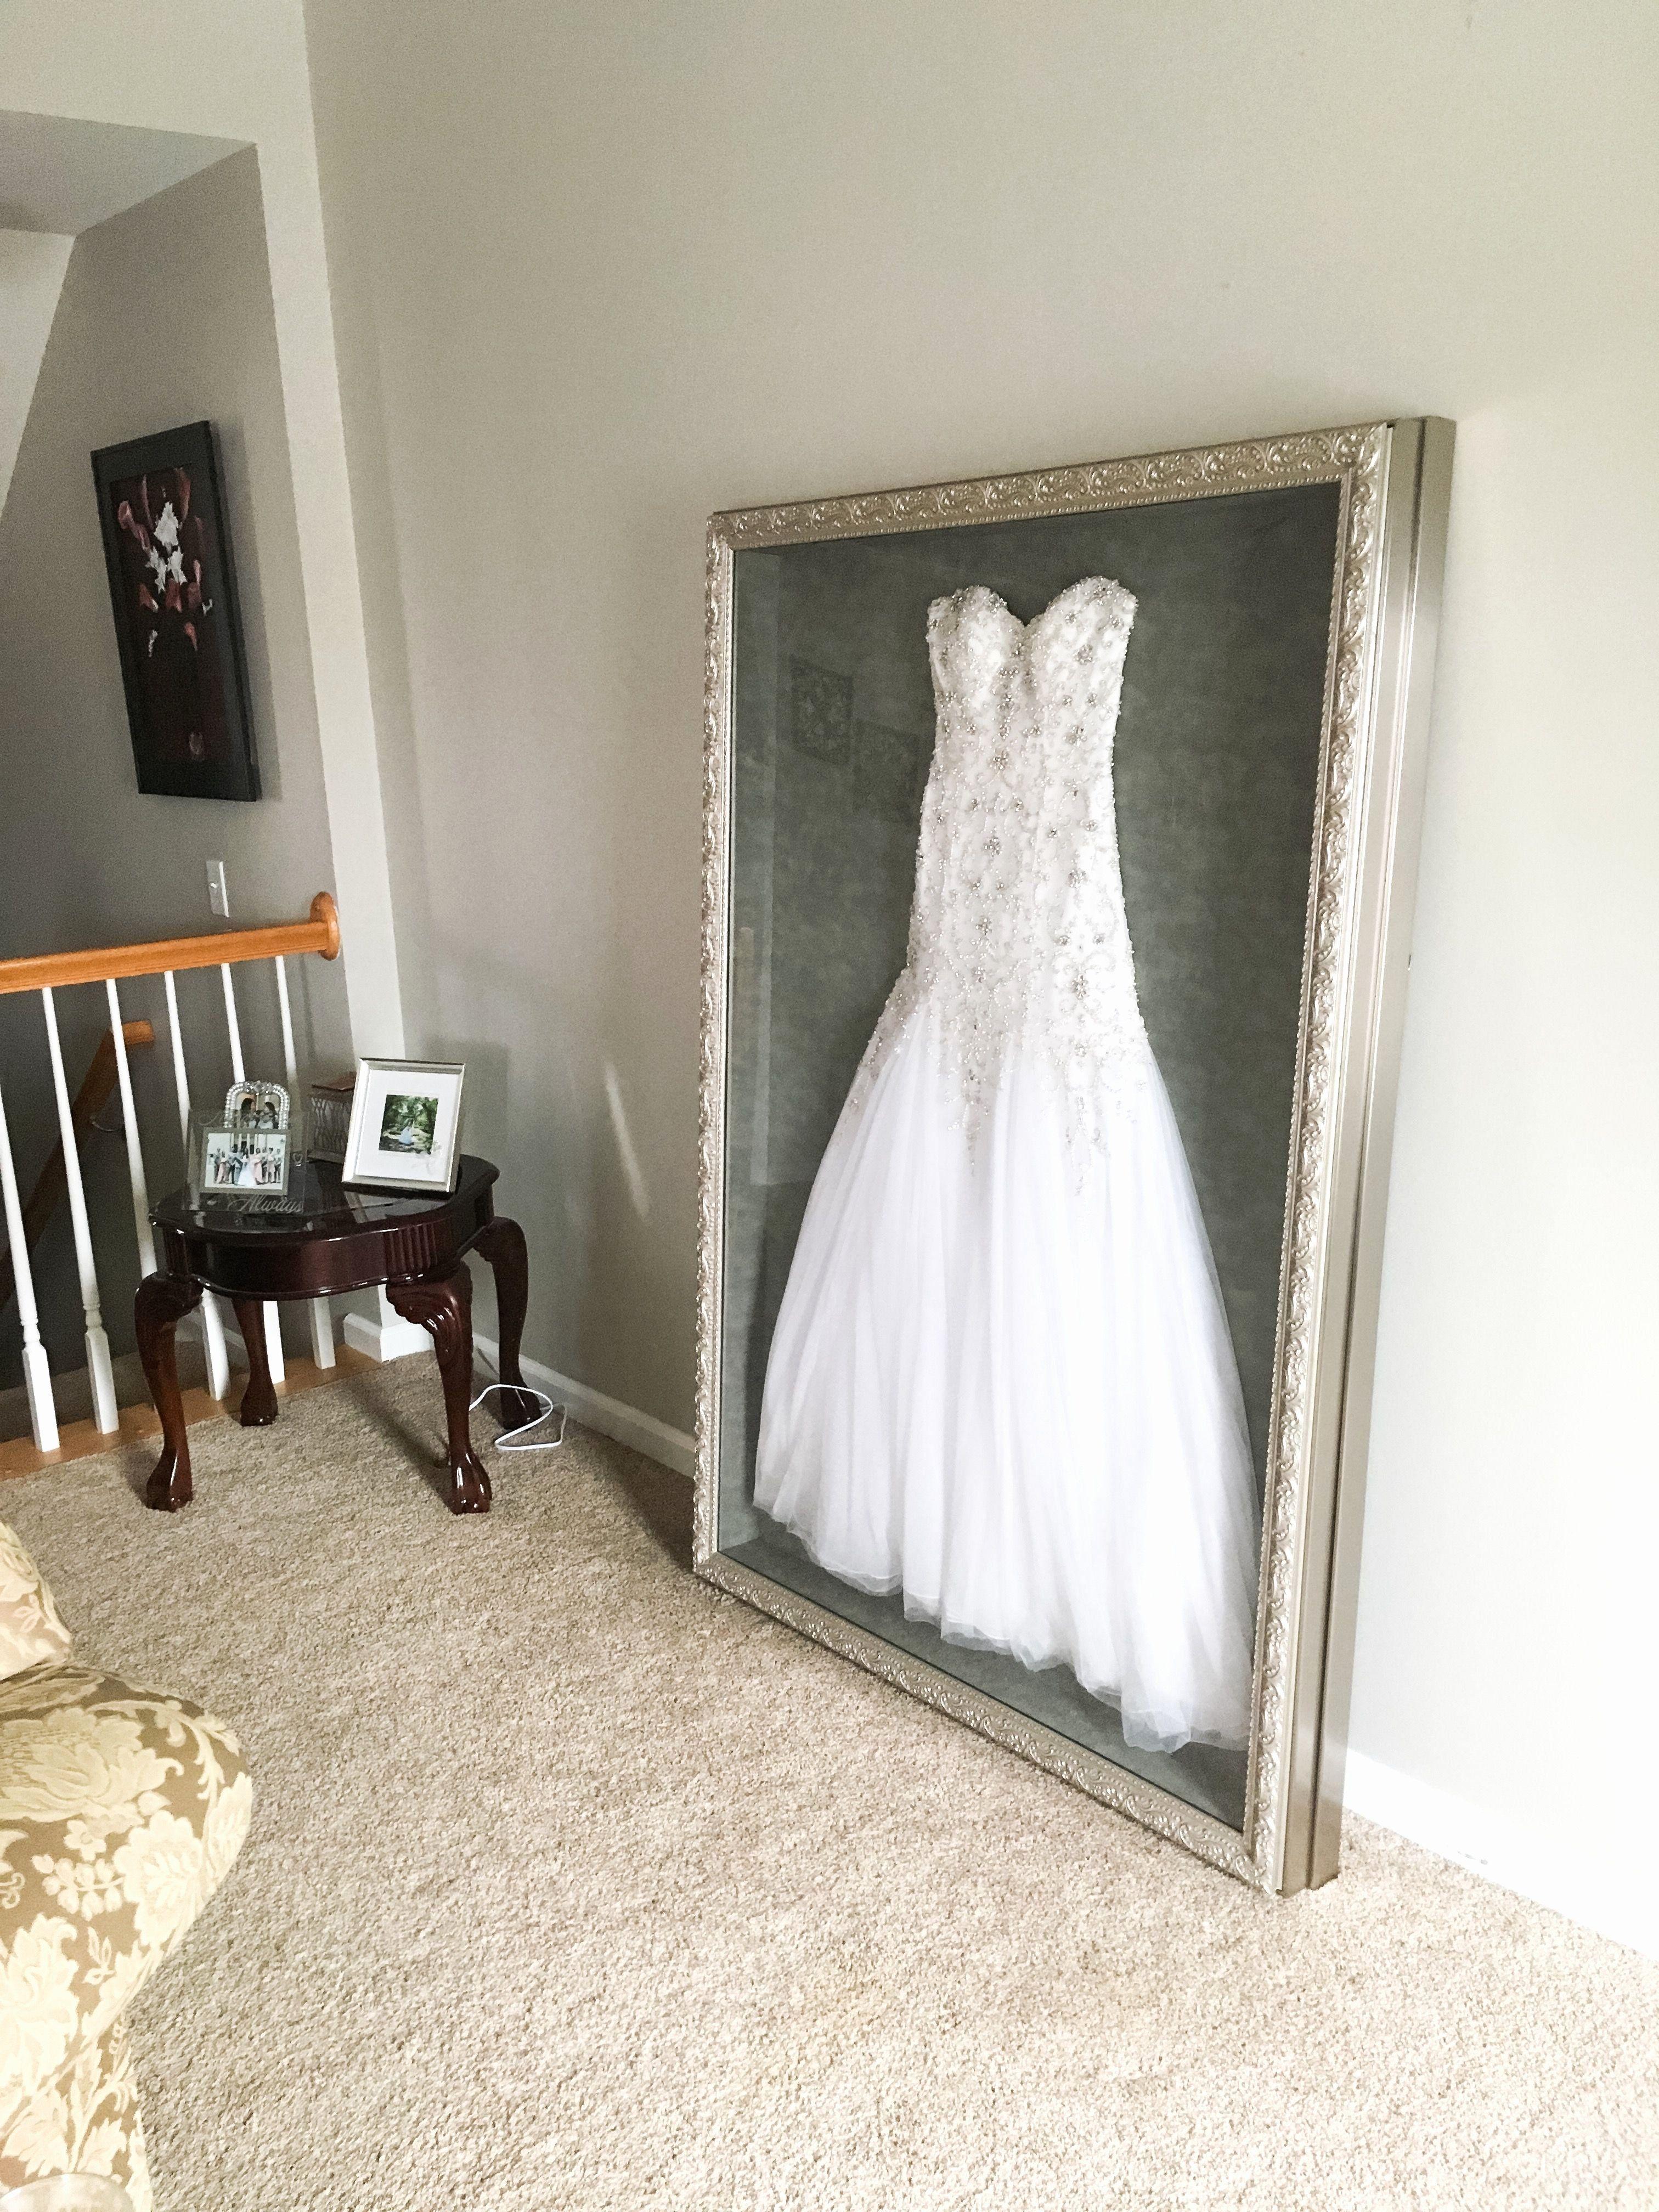 Wedding Dress Cleaned And Preserved Beautiful Wedding Dress Preservation Box Luxury Kleinfeld B In 2020 Wedding Dress Storage Wedding Dress Frame Wedding Dress Display